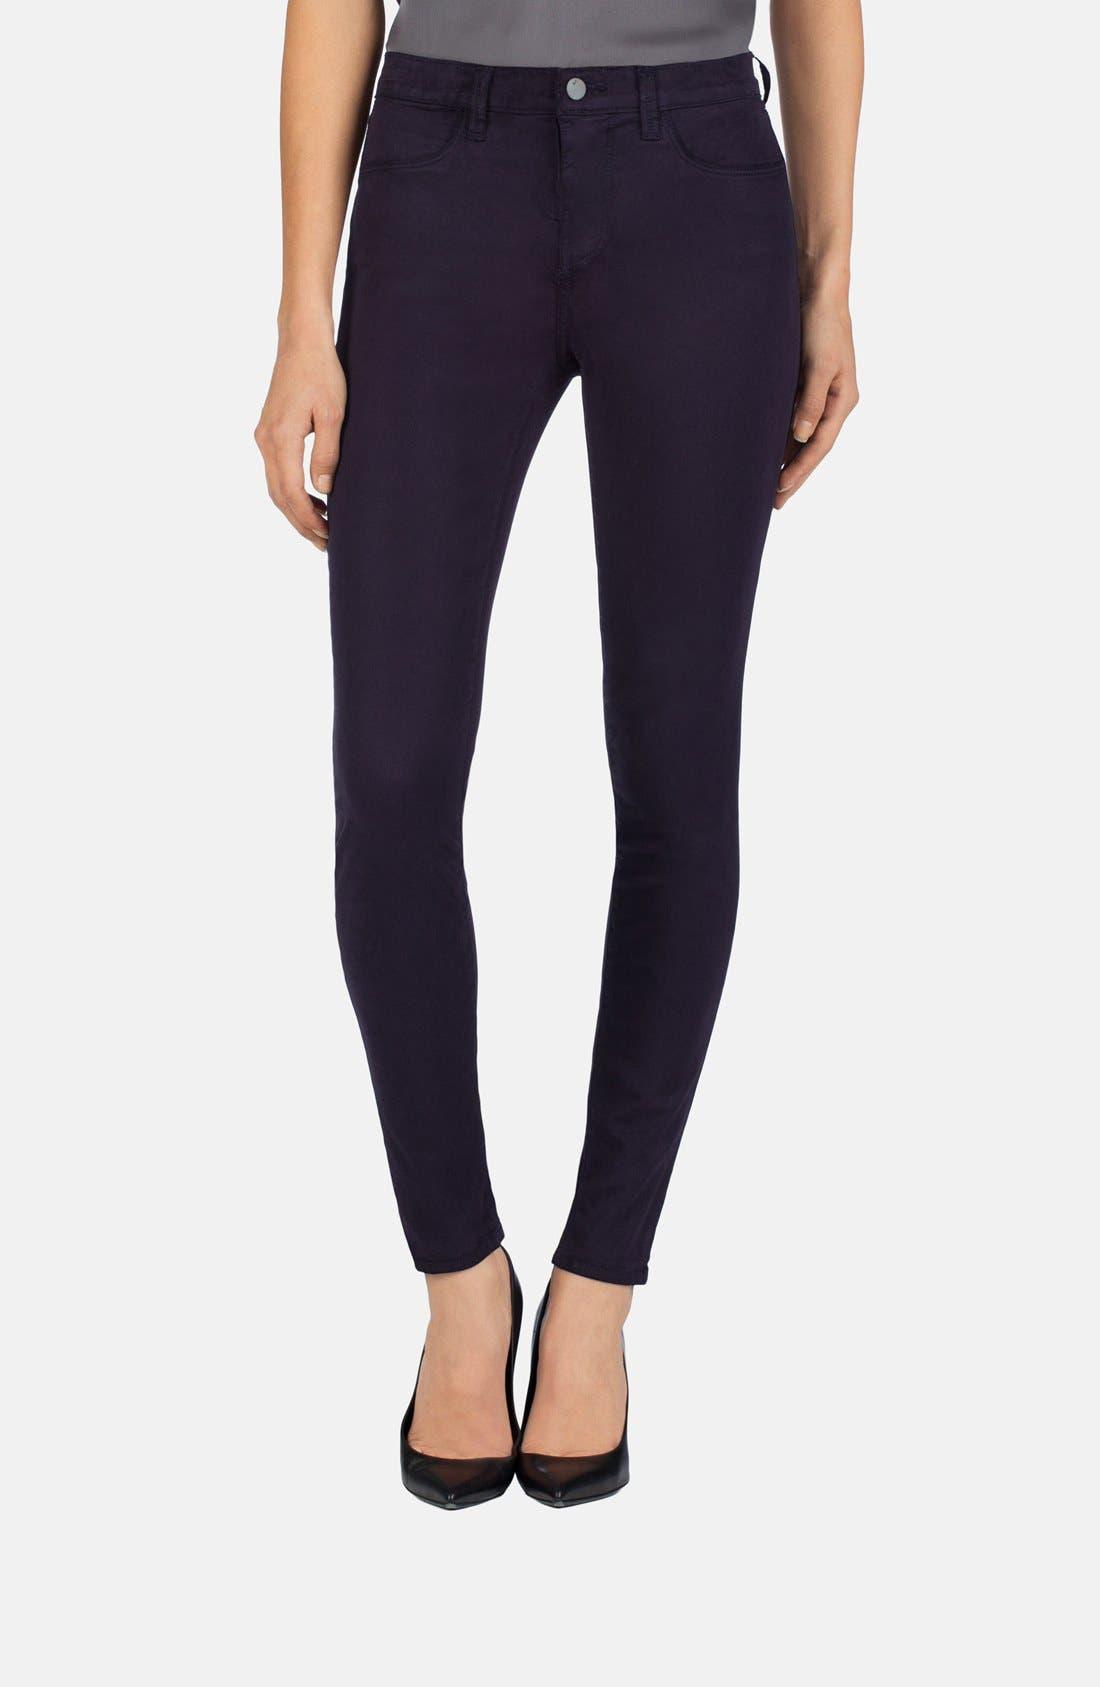 Main Image - J Brand '485' Mid Rise Super Skinny Jeans (Blackberry)